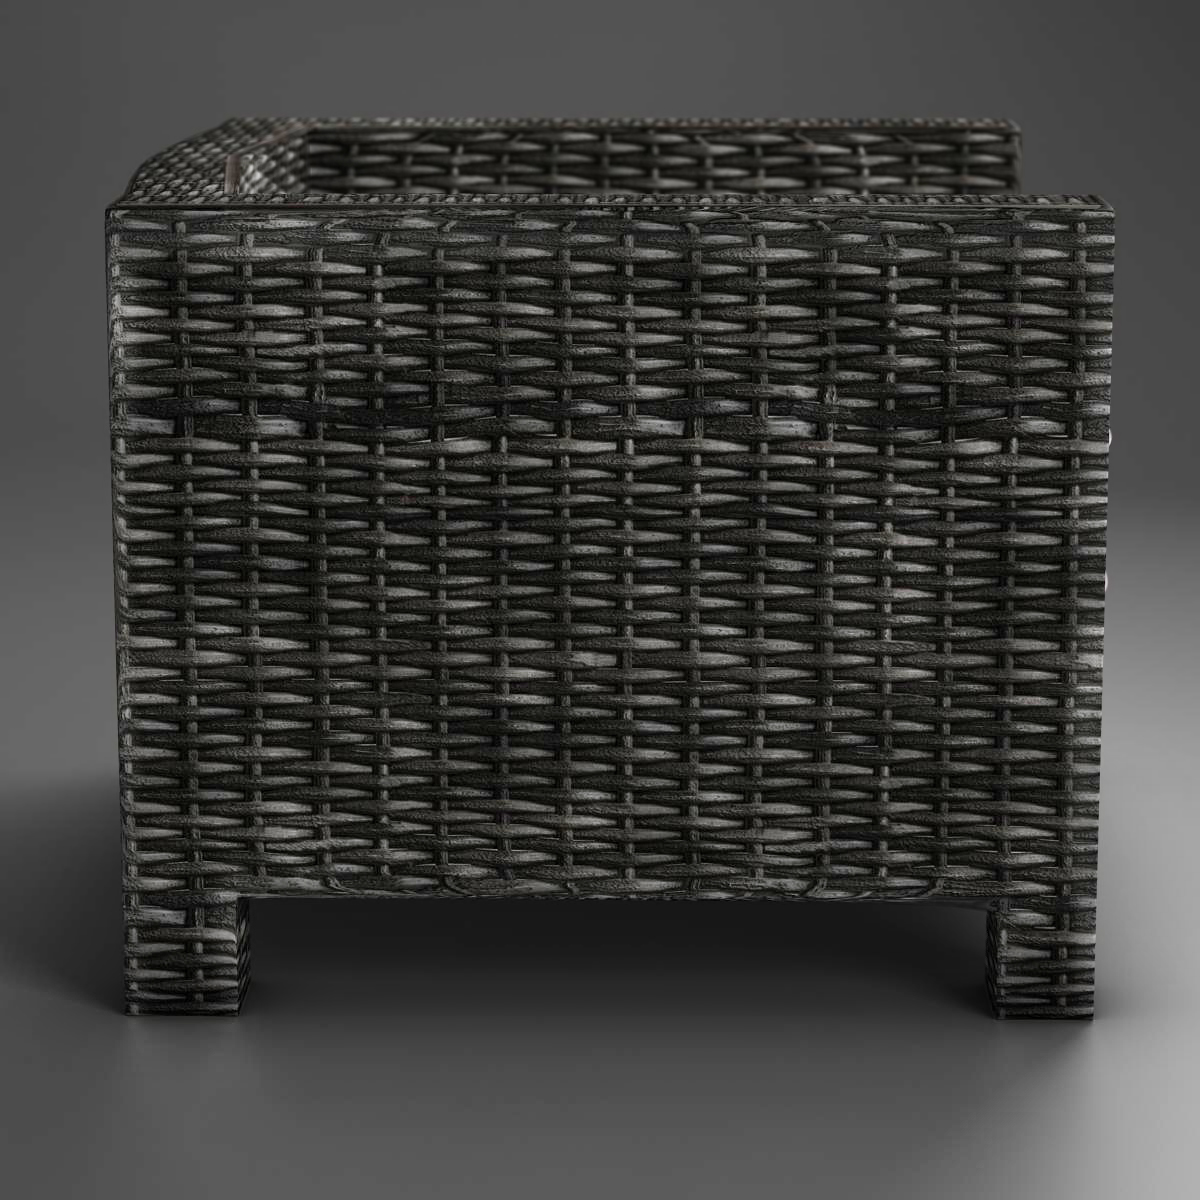 зэгсэн сандал 3d загвар 3ds max fbx c4d mn obj 162341